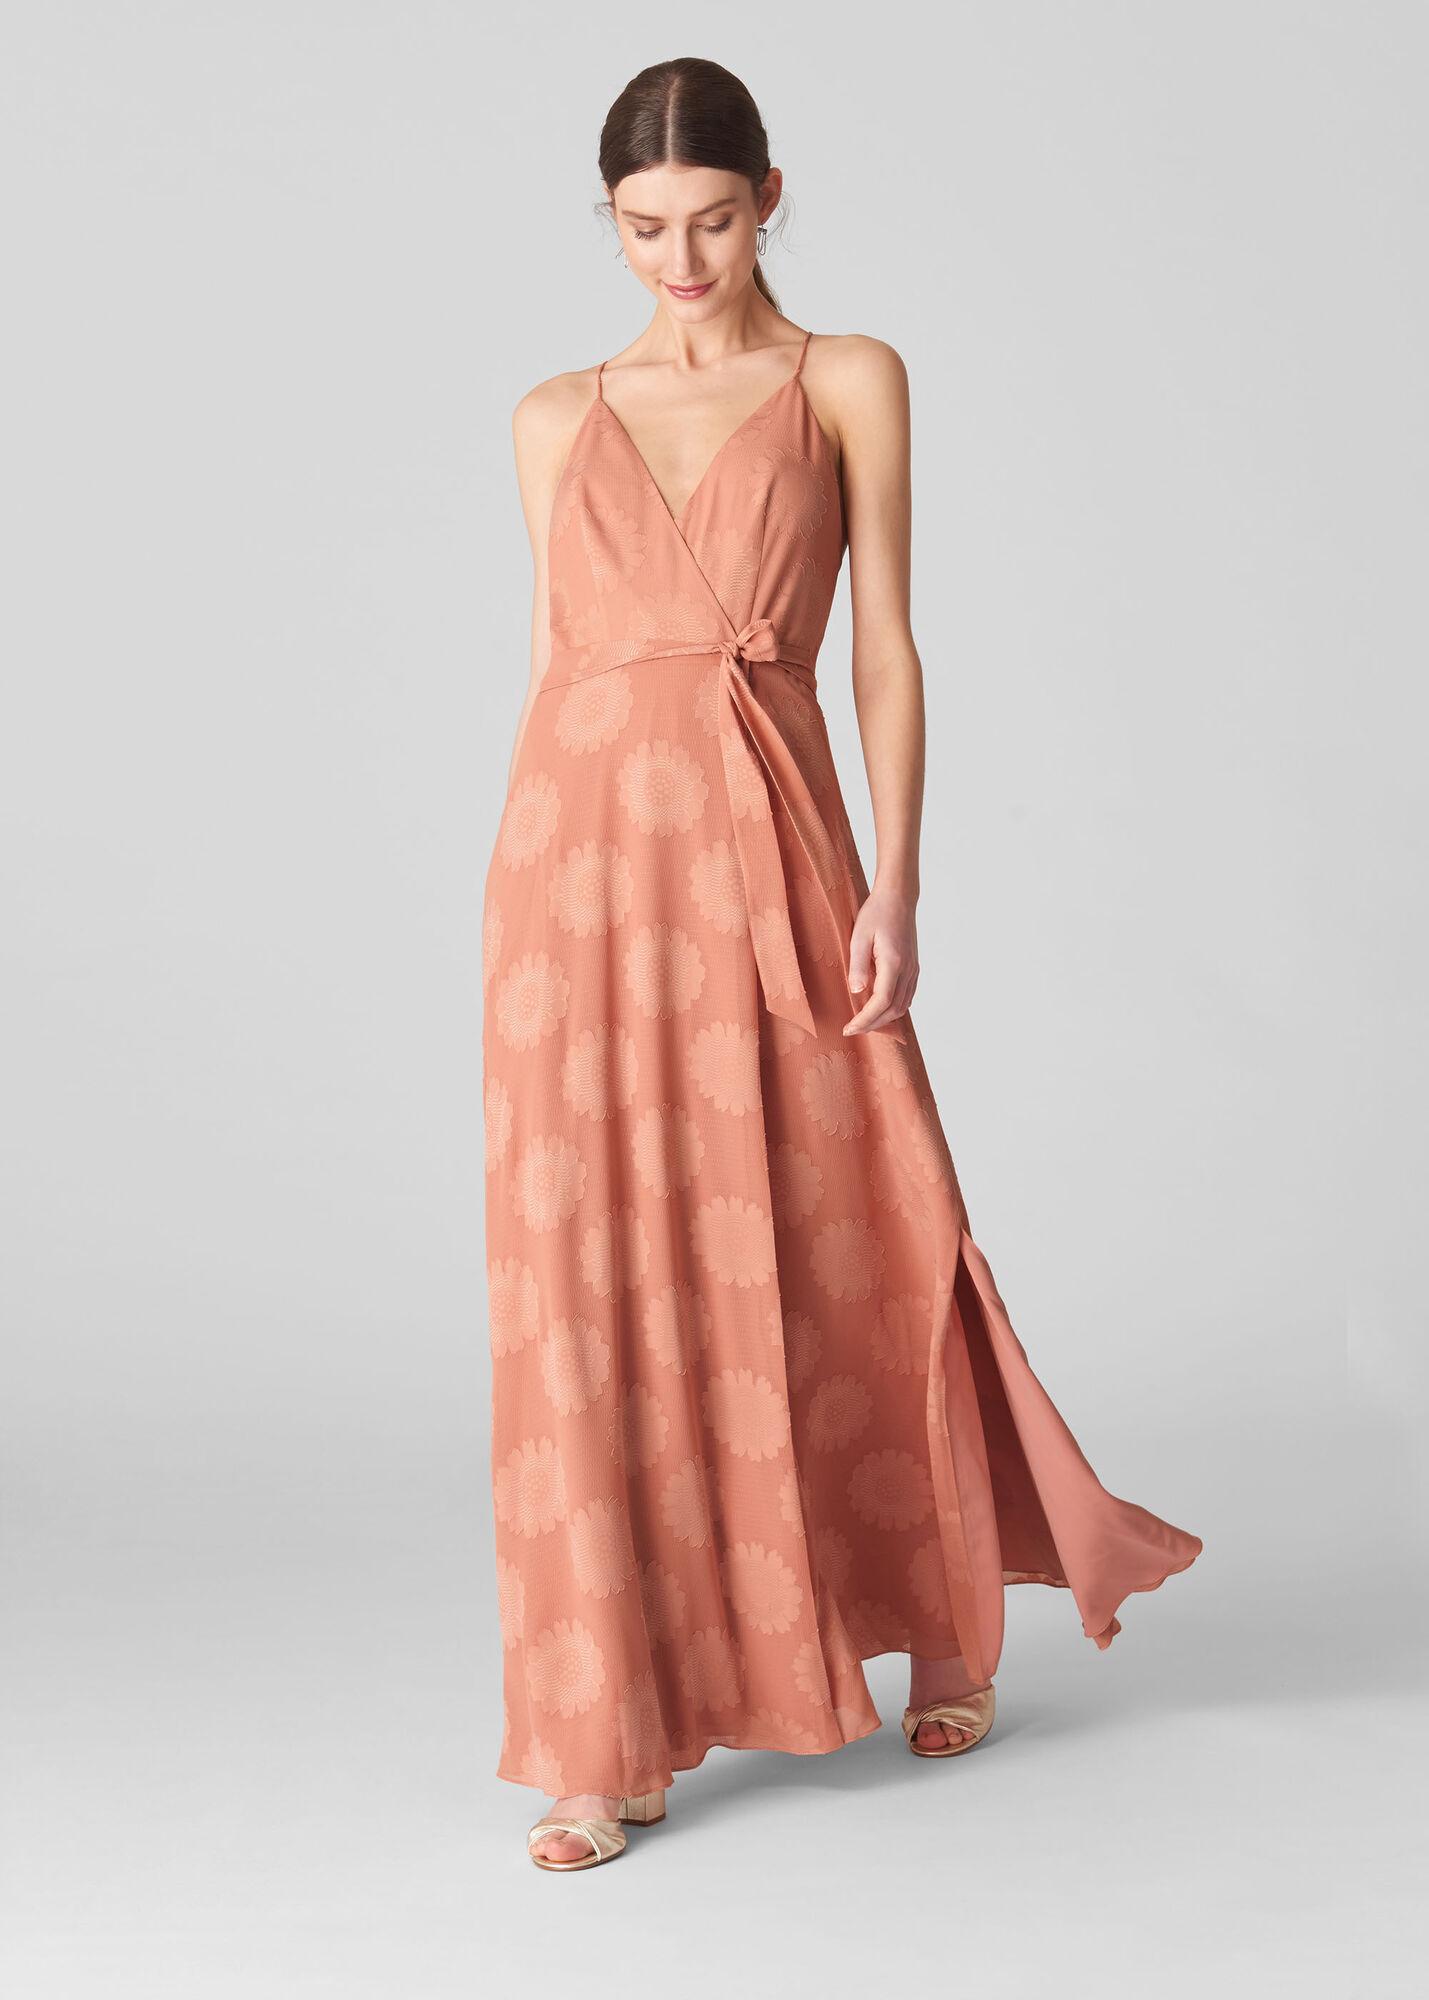 Noa Jacquard Maxi Dress